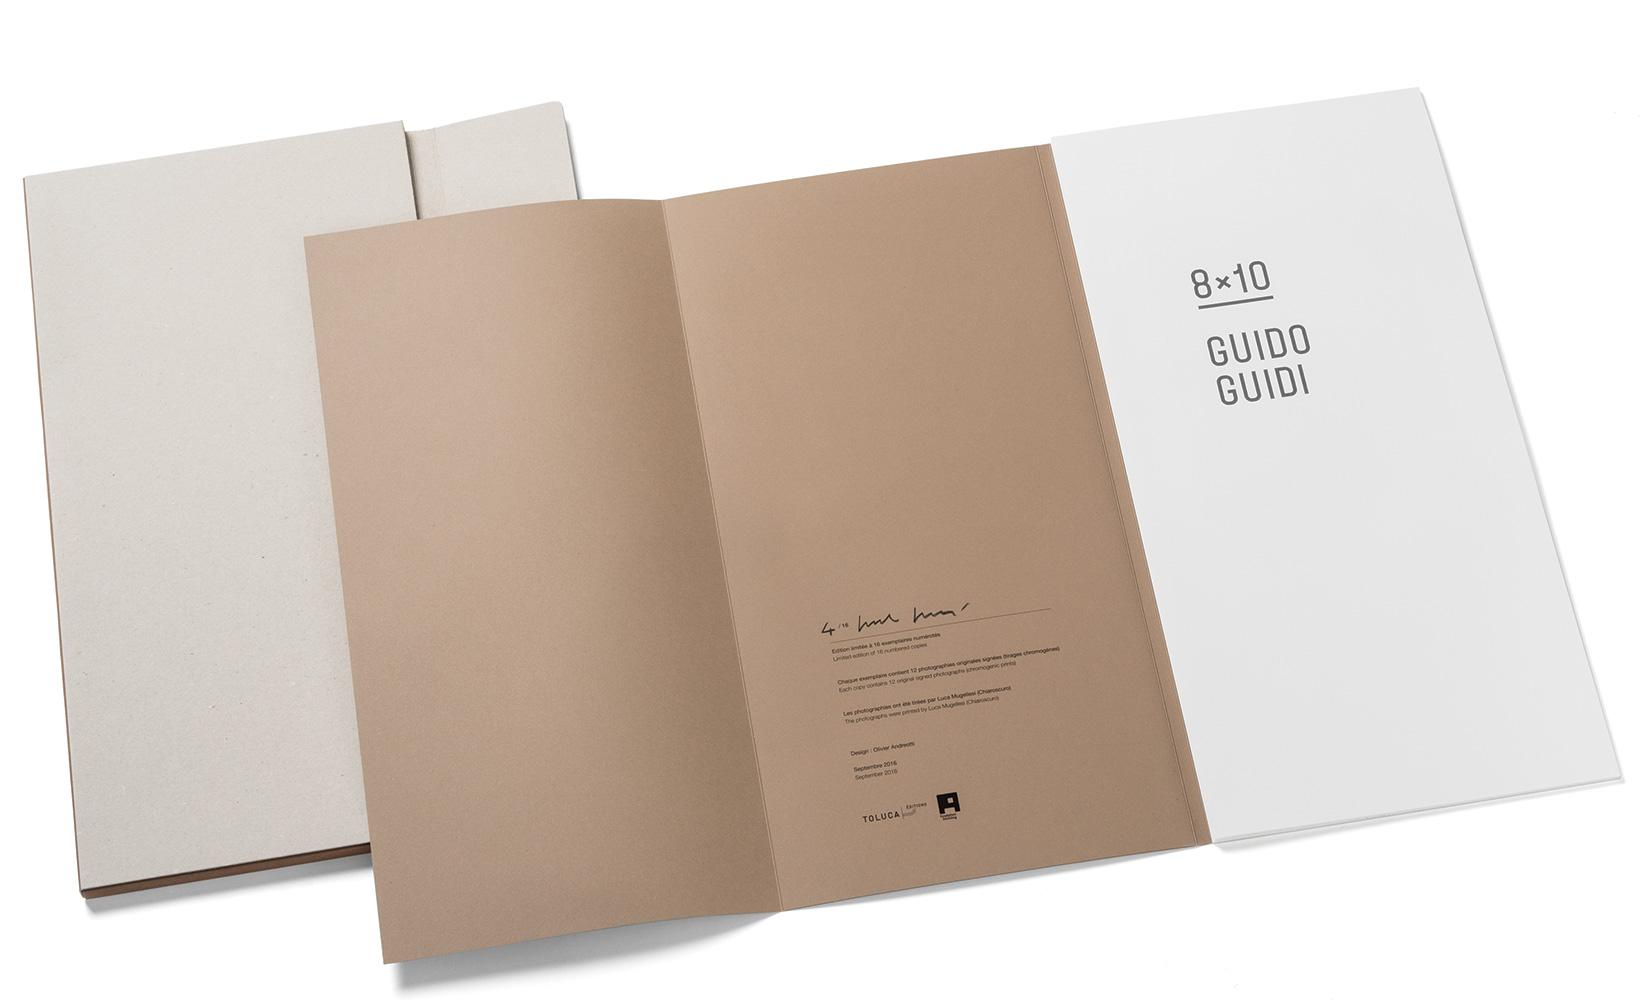 olivier-andreotti-guido-GUIDI-04.jpg